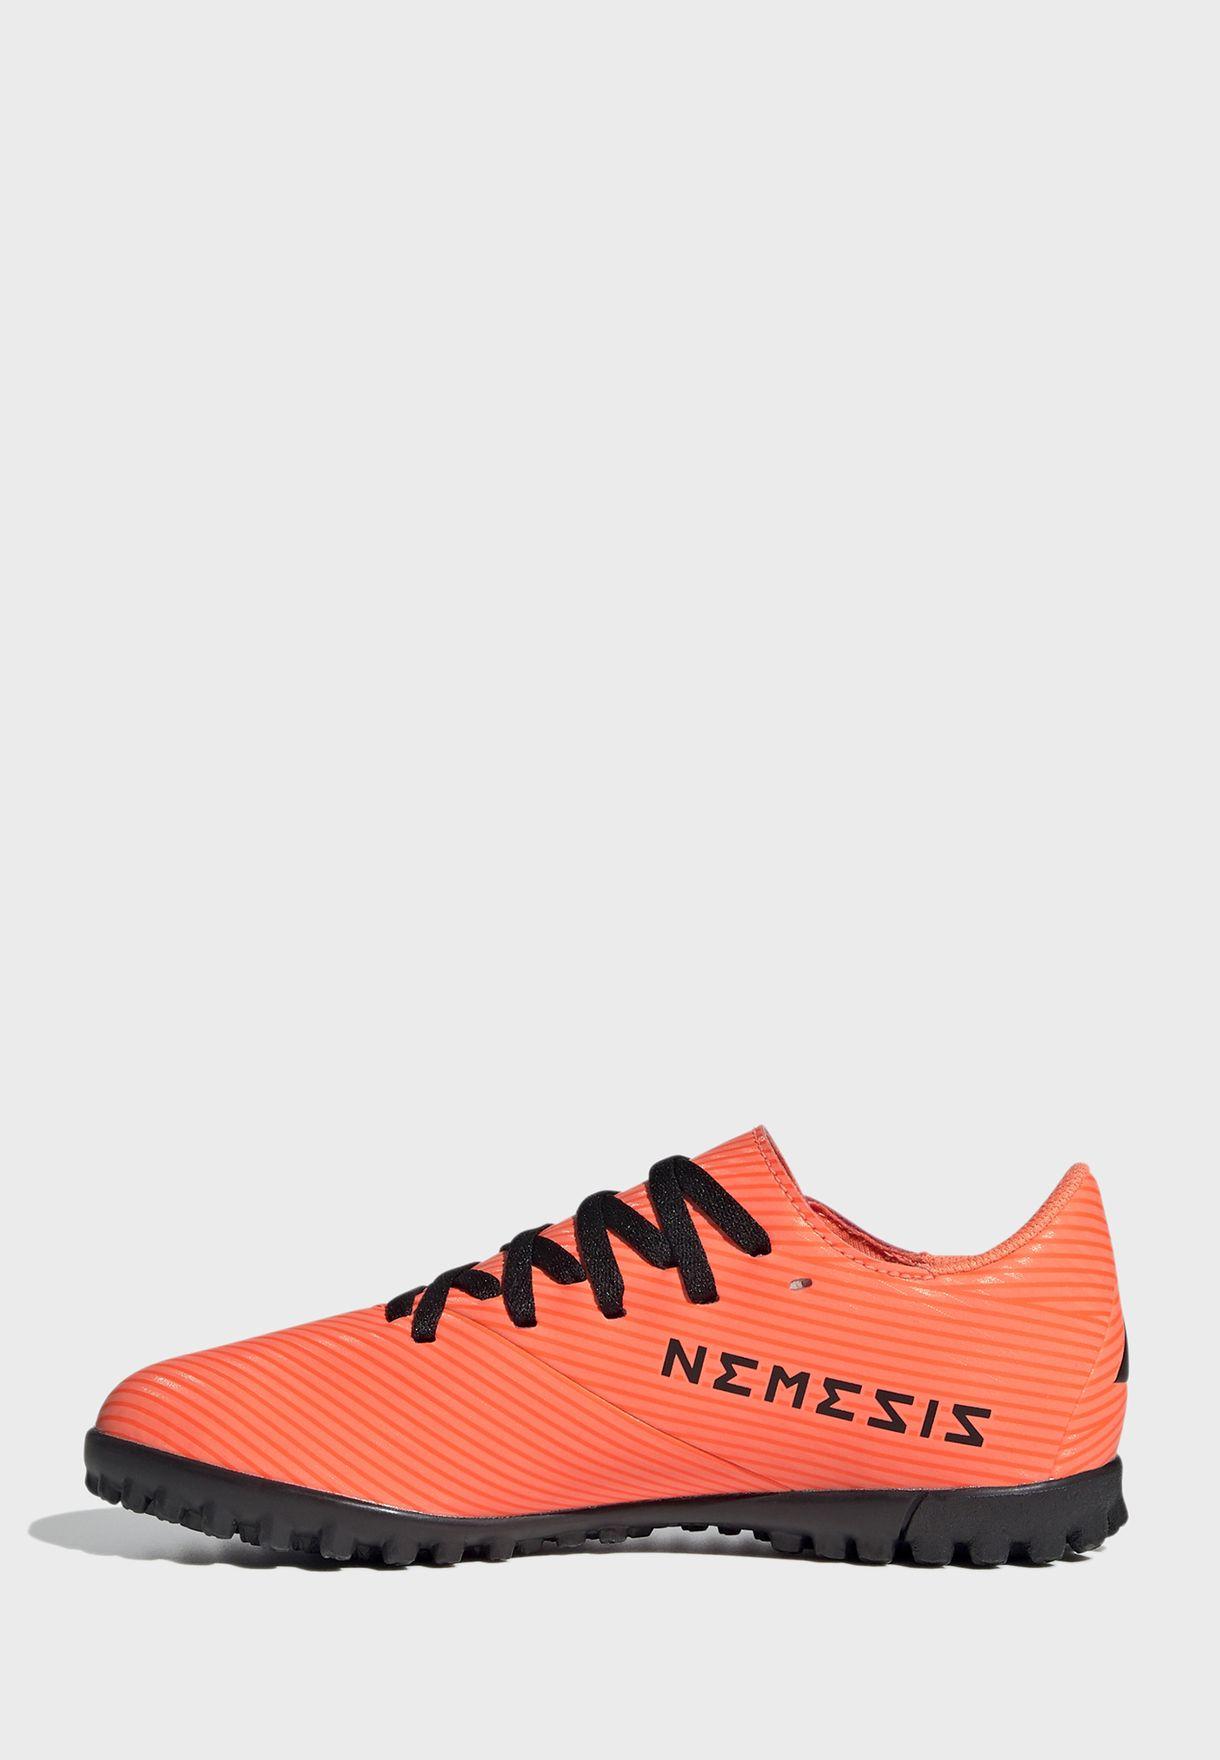 حذاء نيميزز 19.4 تي اف